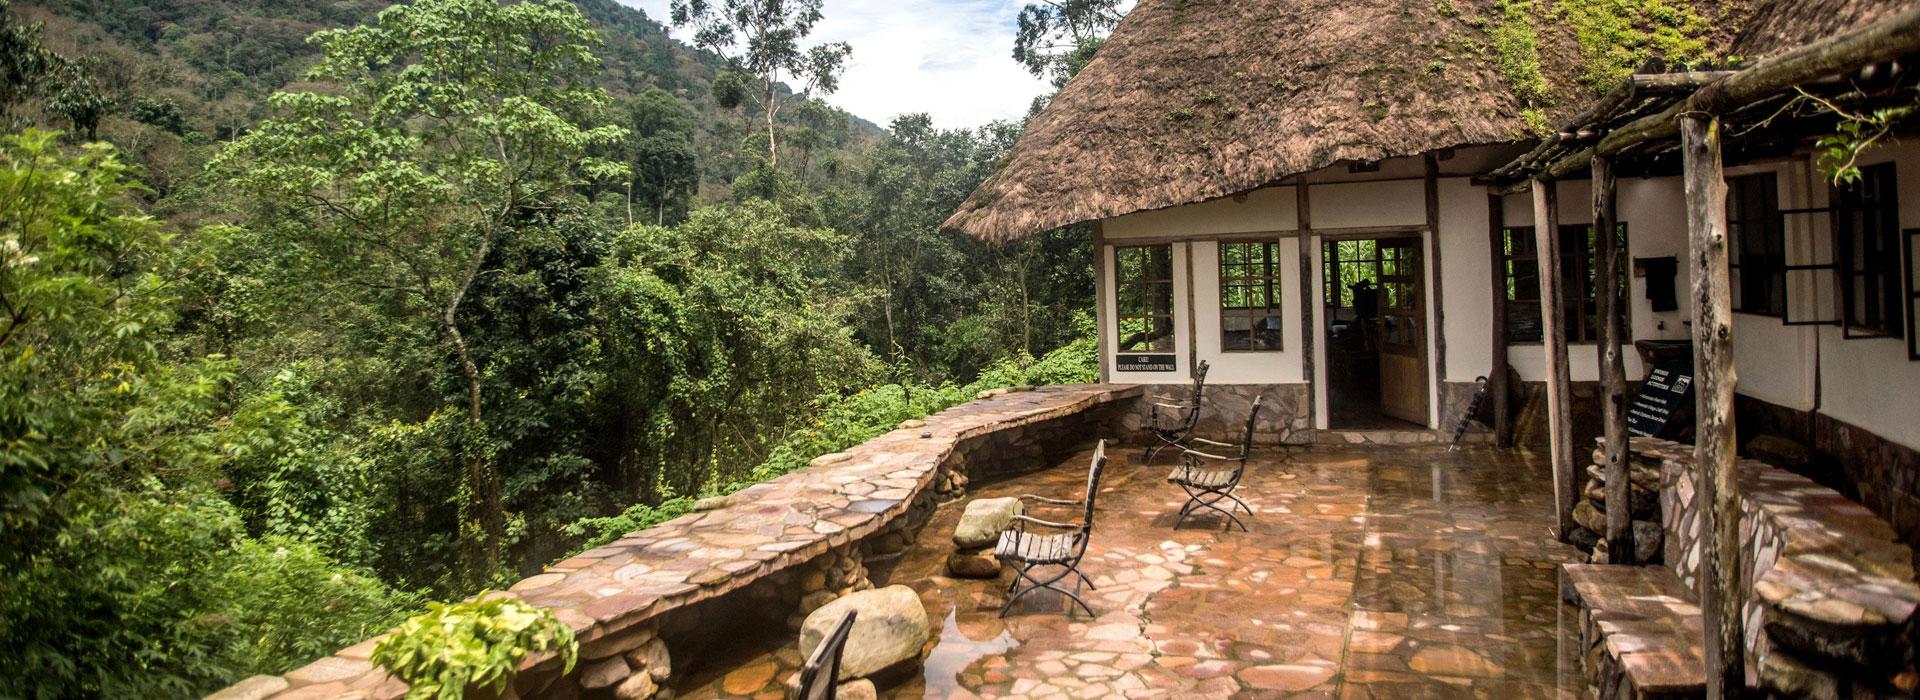 Uganda Accommodations